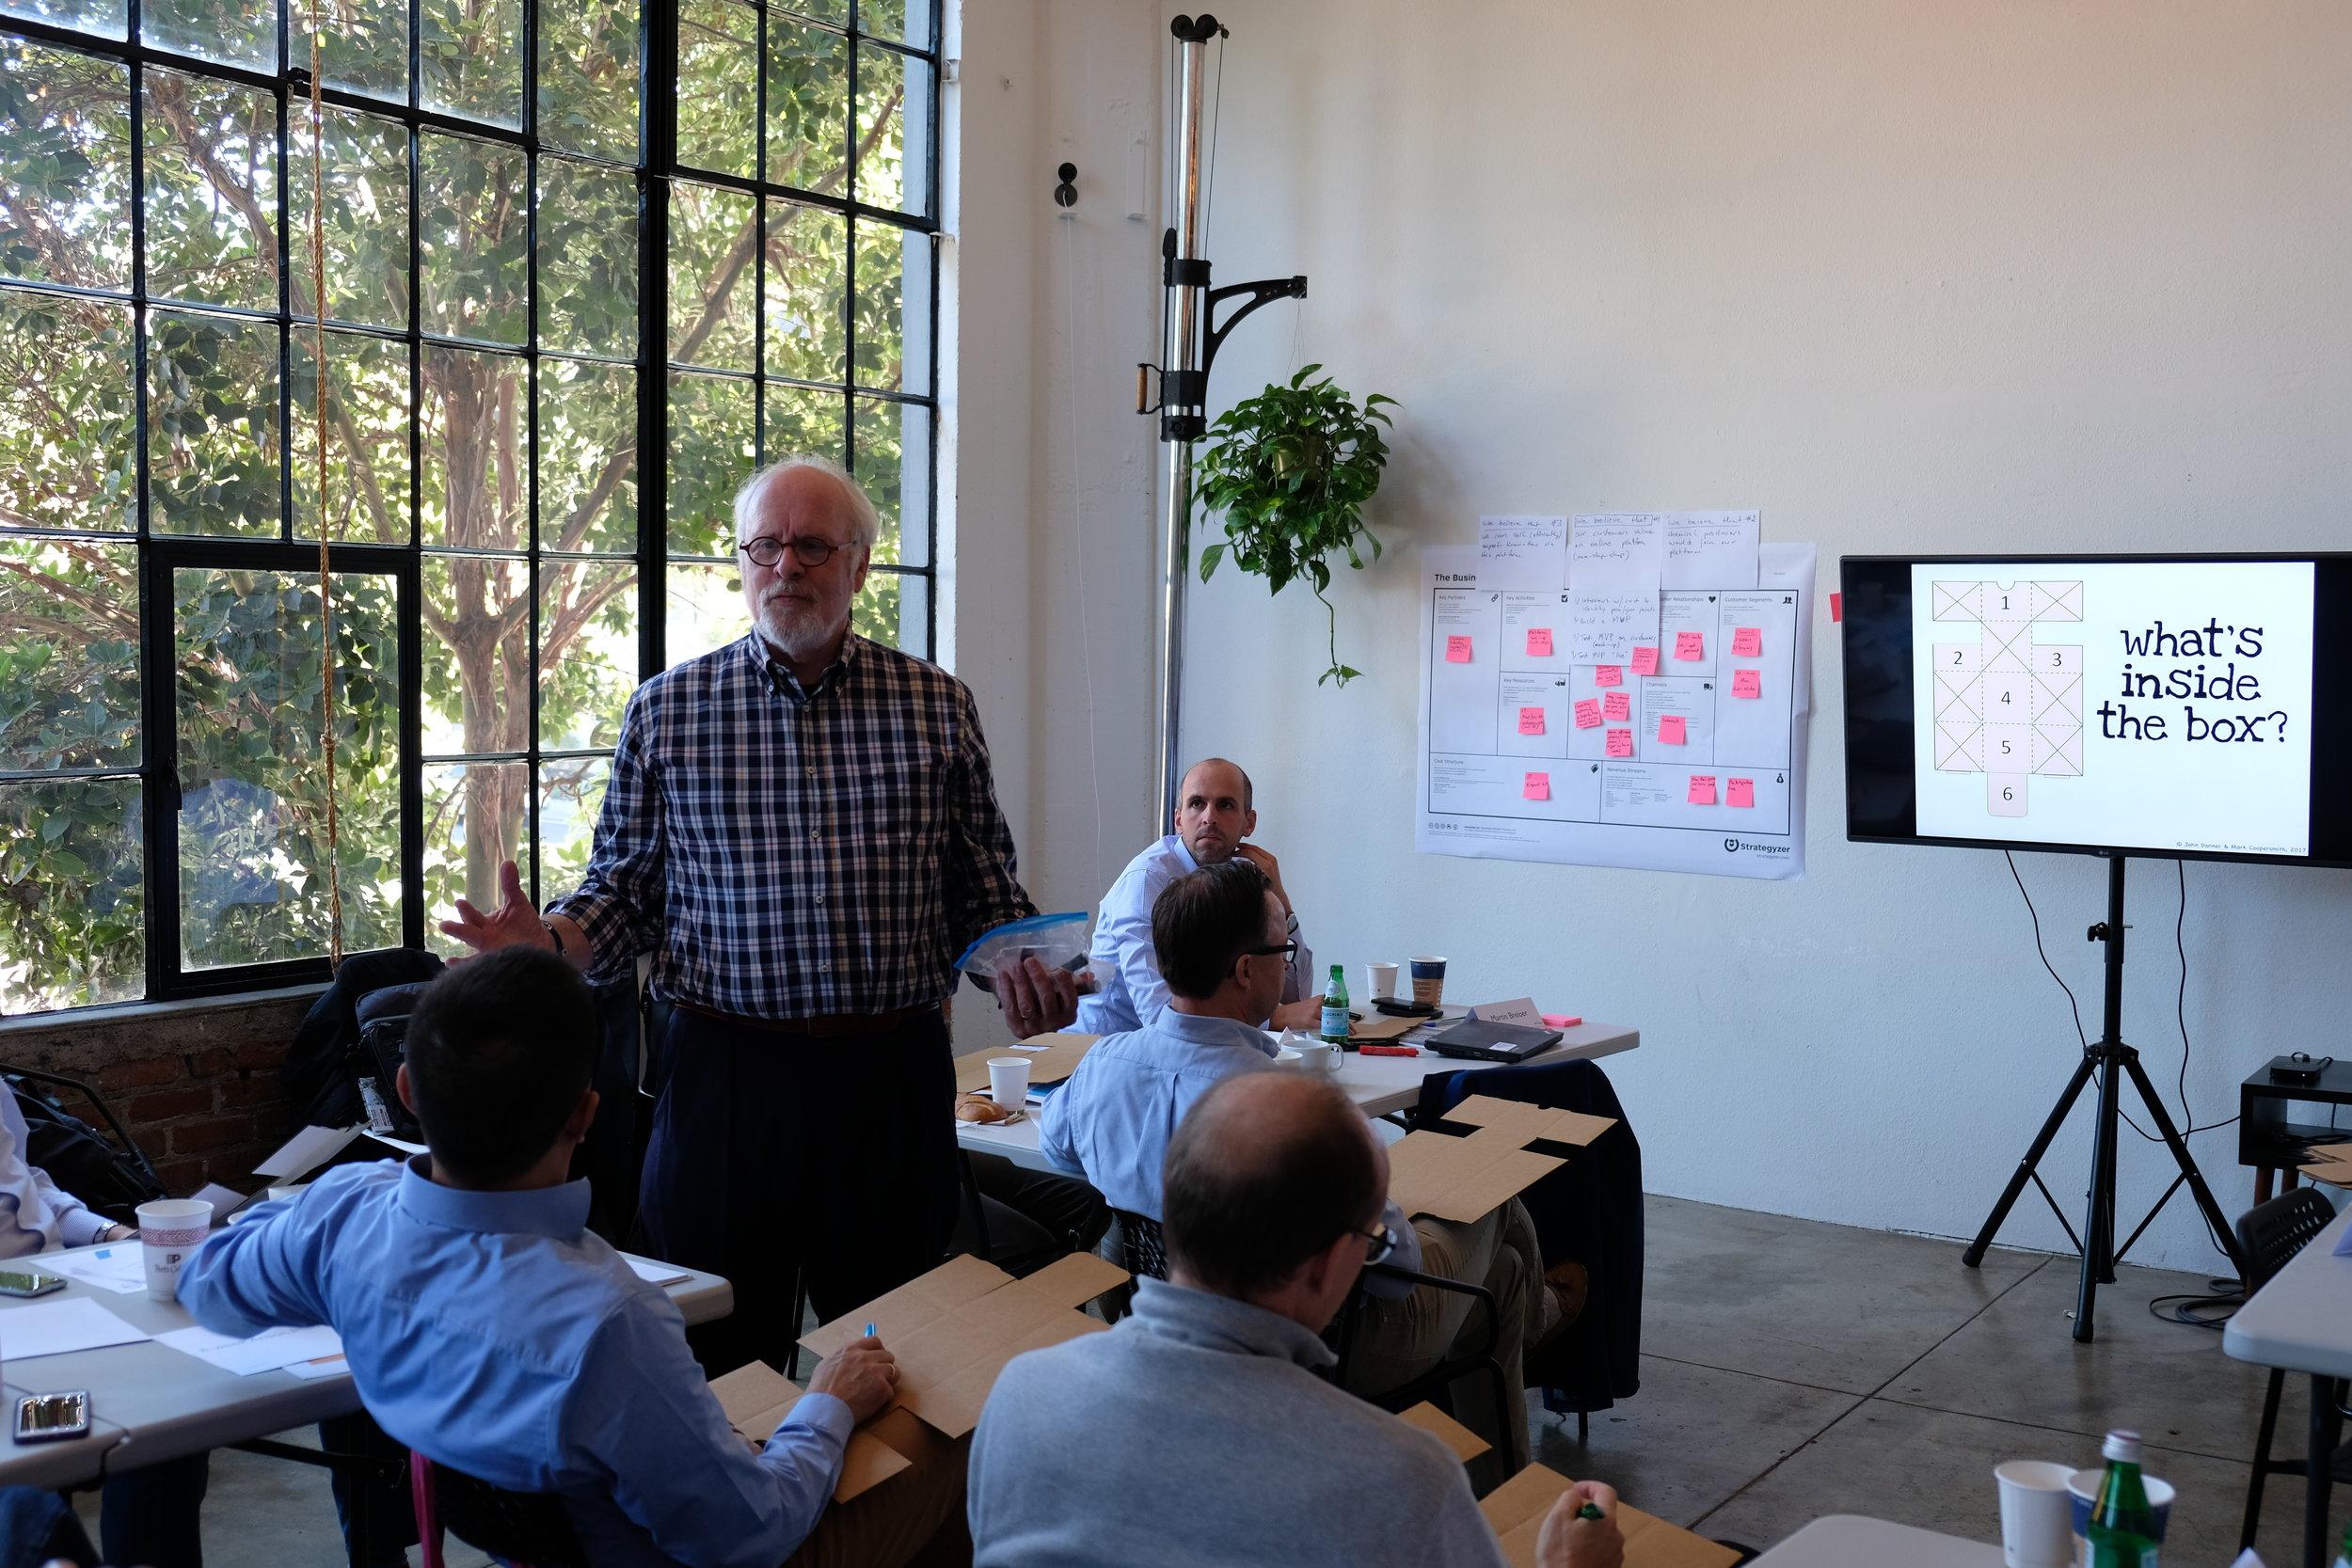 Workshop with John Danner